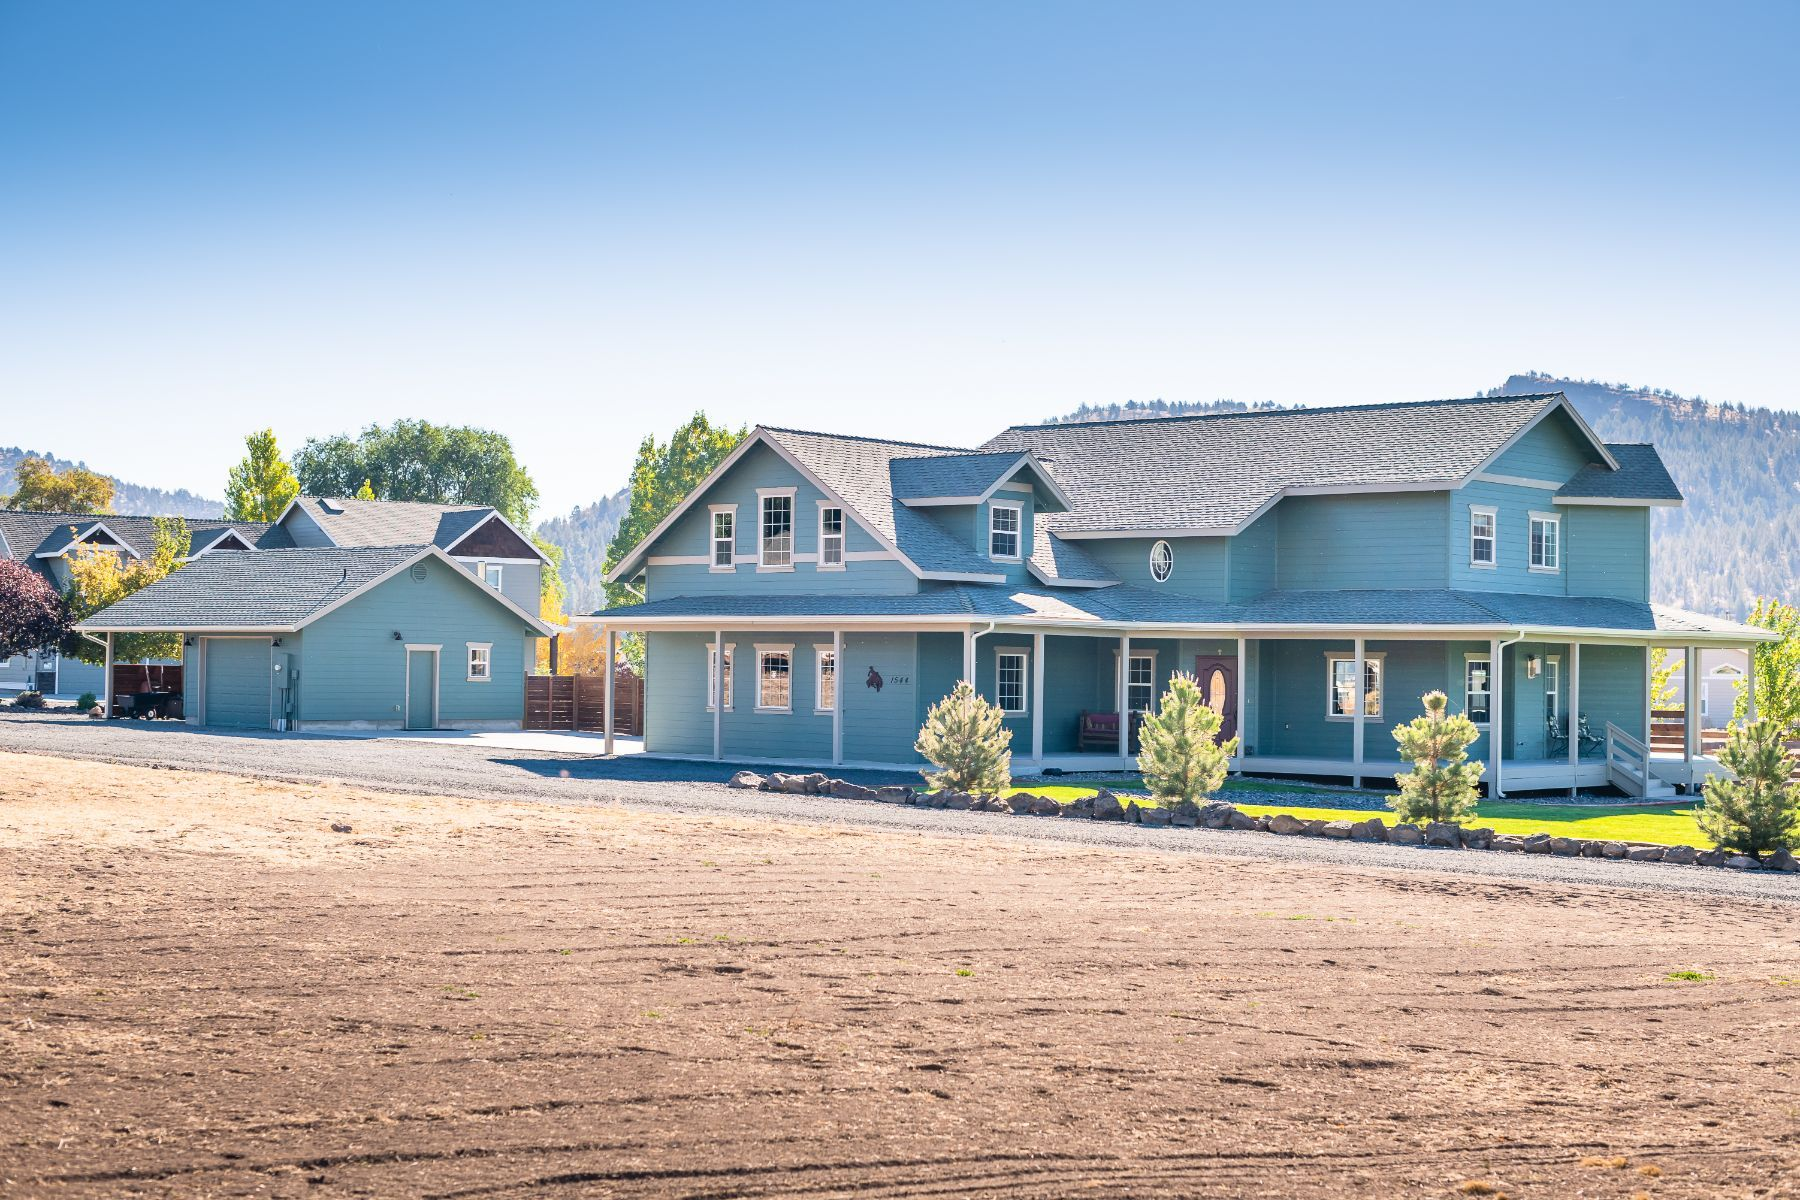 Other Residential Homes for Active at 1544 NE Haytons Elk View Lane Prineville, OR 97754 1544 NE Haytons Elk View Lane Prineville, Oregon 97754 United States